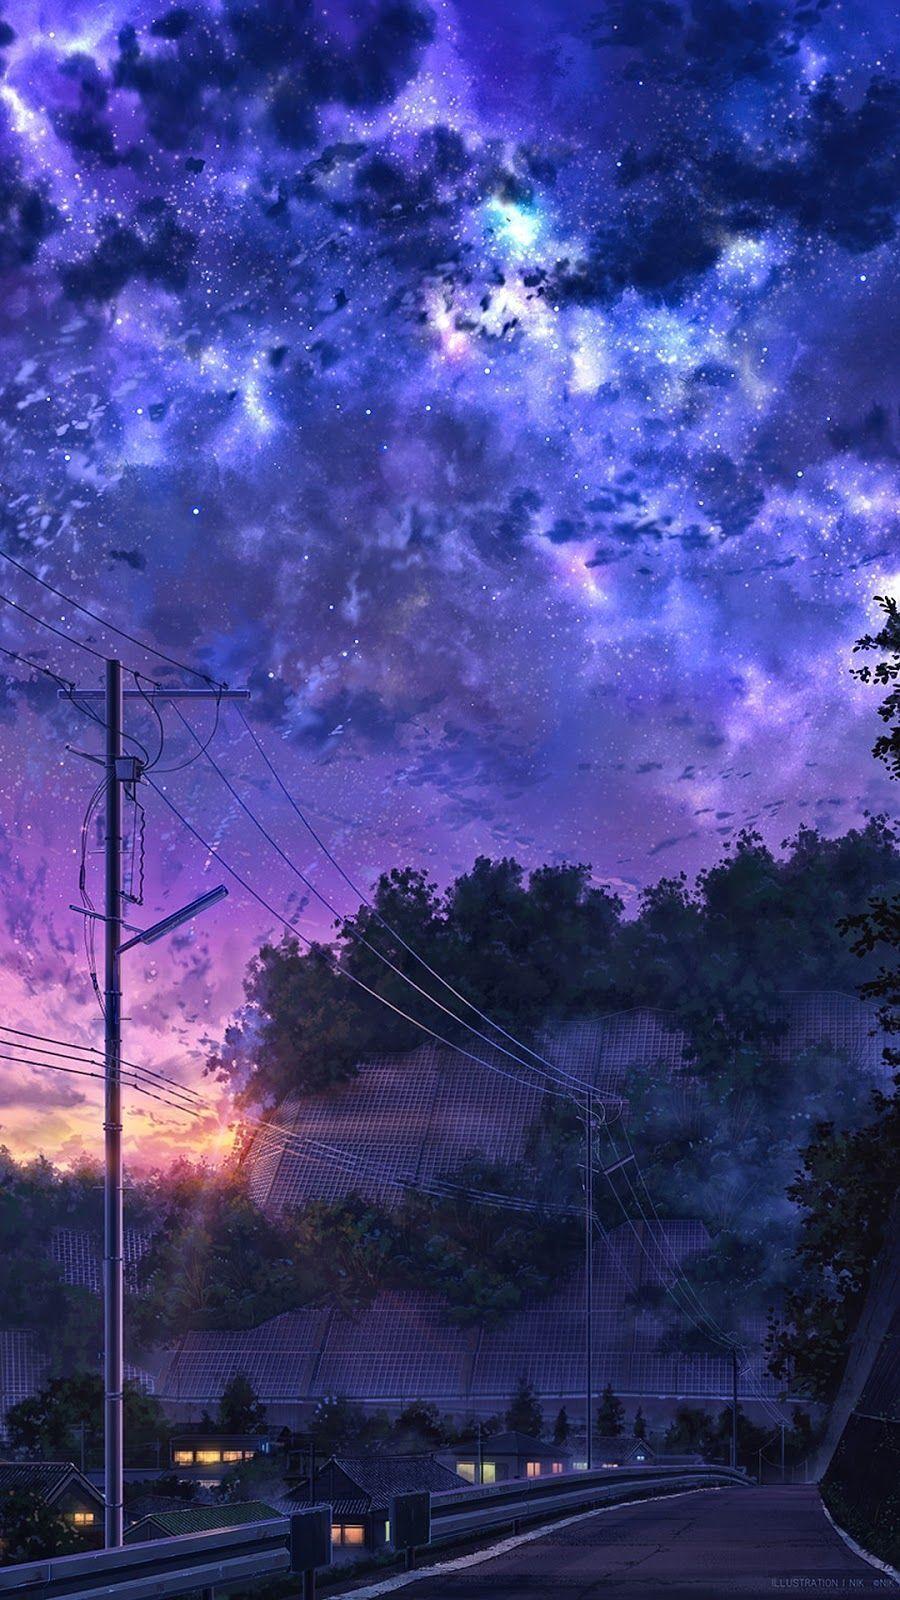 Aesthetic Anime Phone Background Wallpapersalbum C In 2020 Scenery Wallpaper Anime Scenery Sky Anime